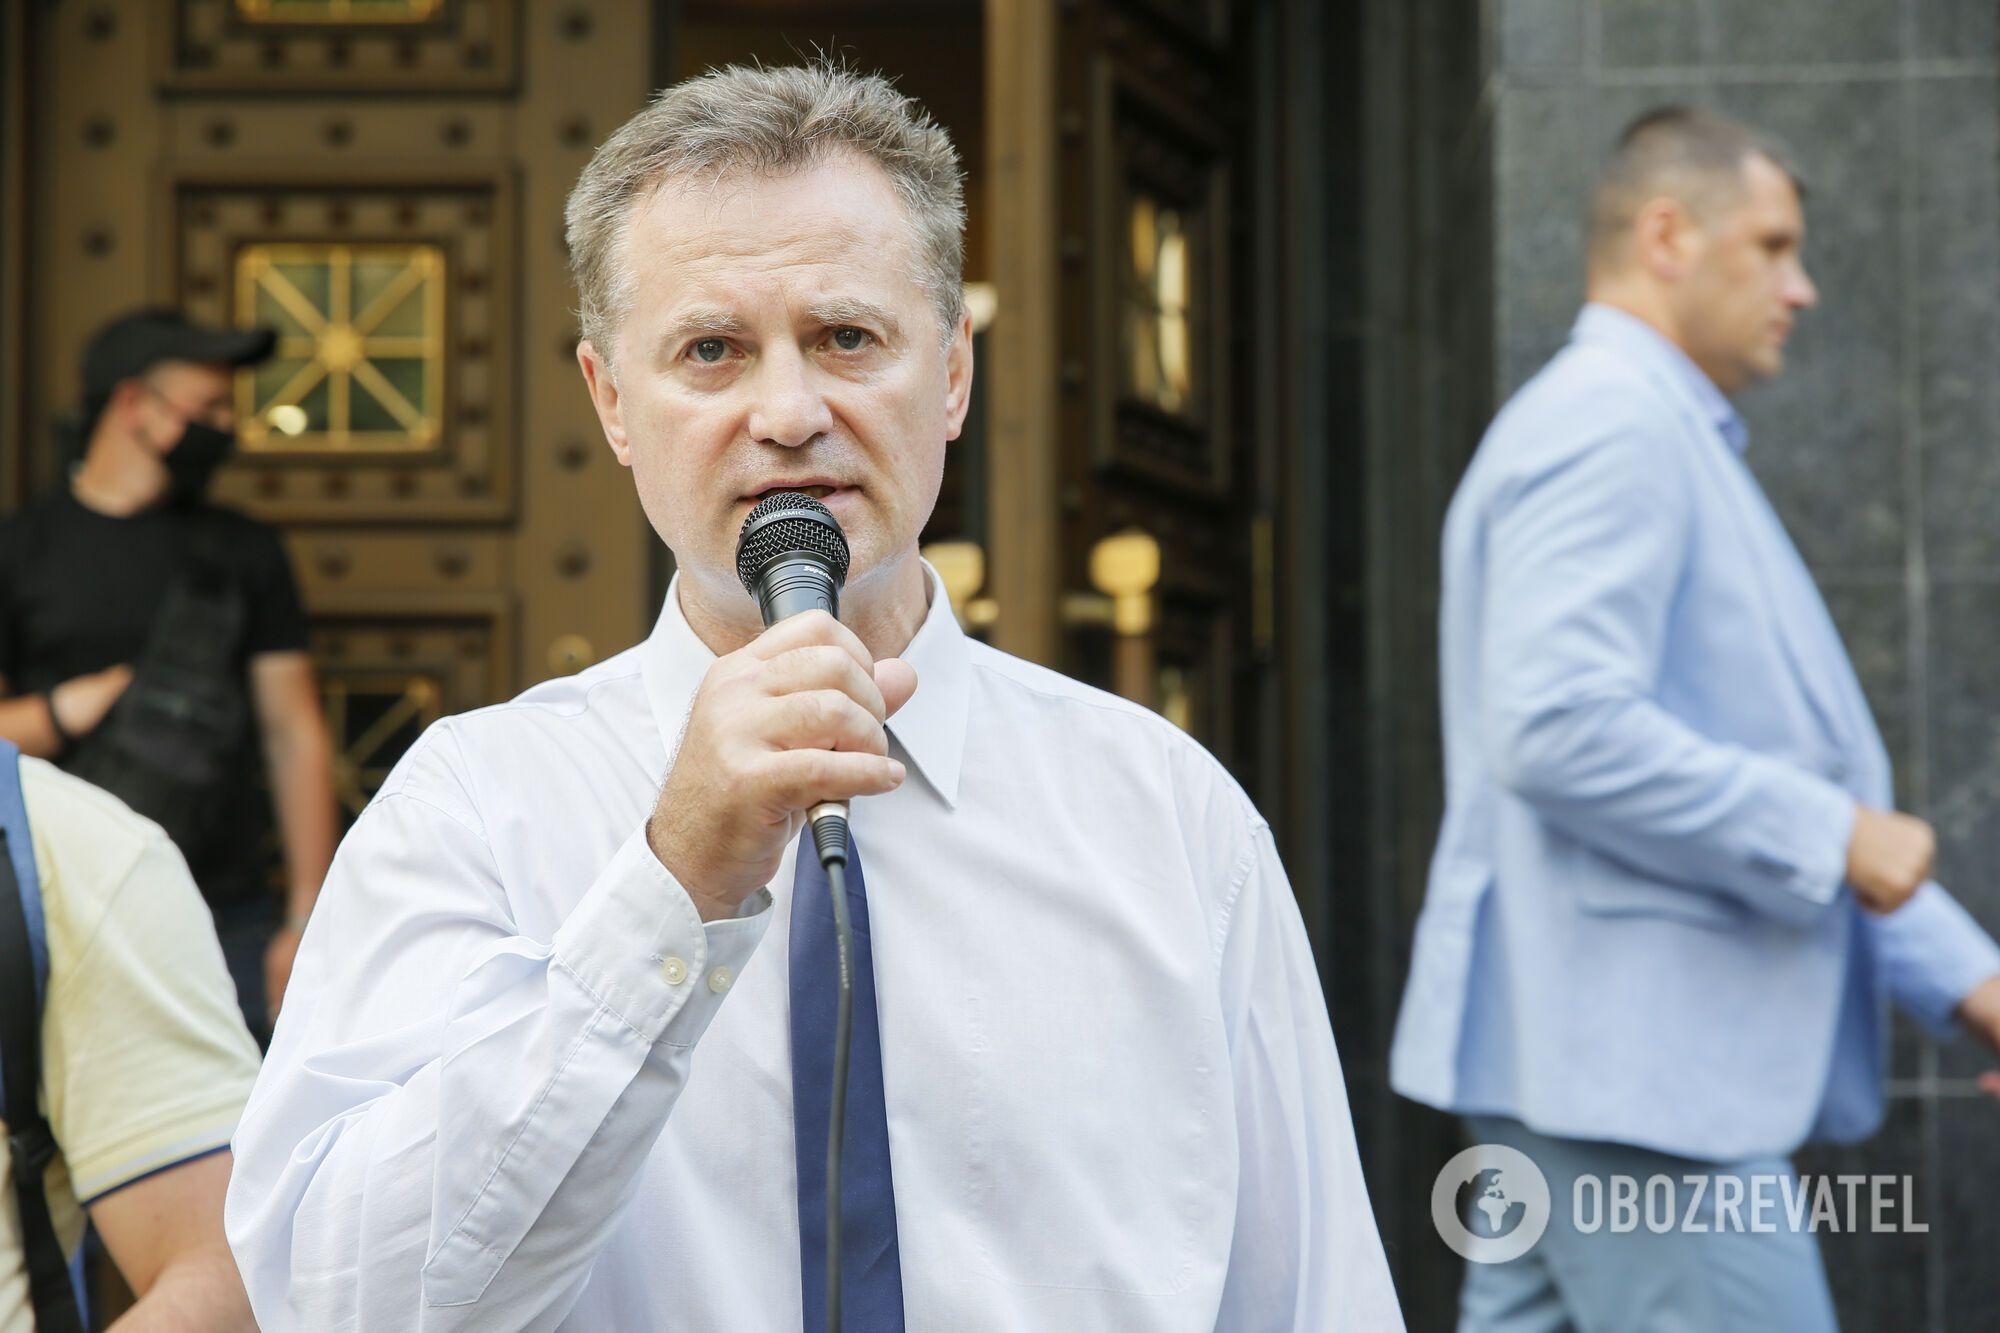 Активист Дмитрий Павличенко